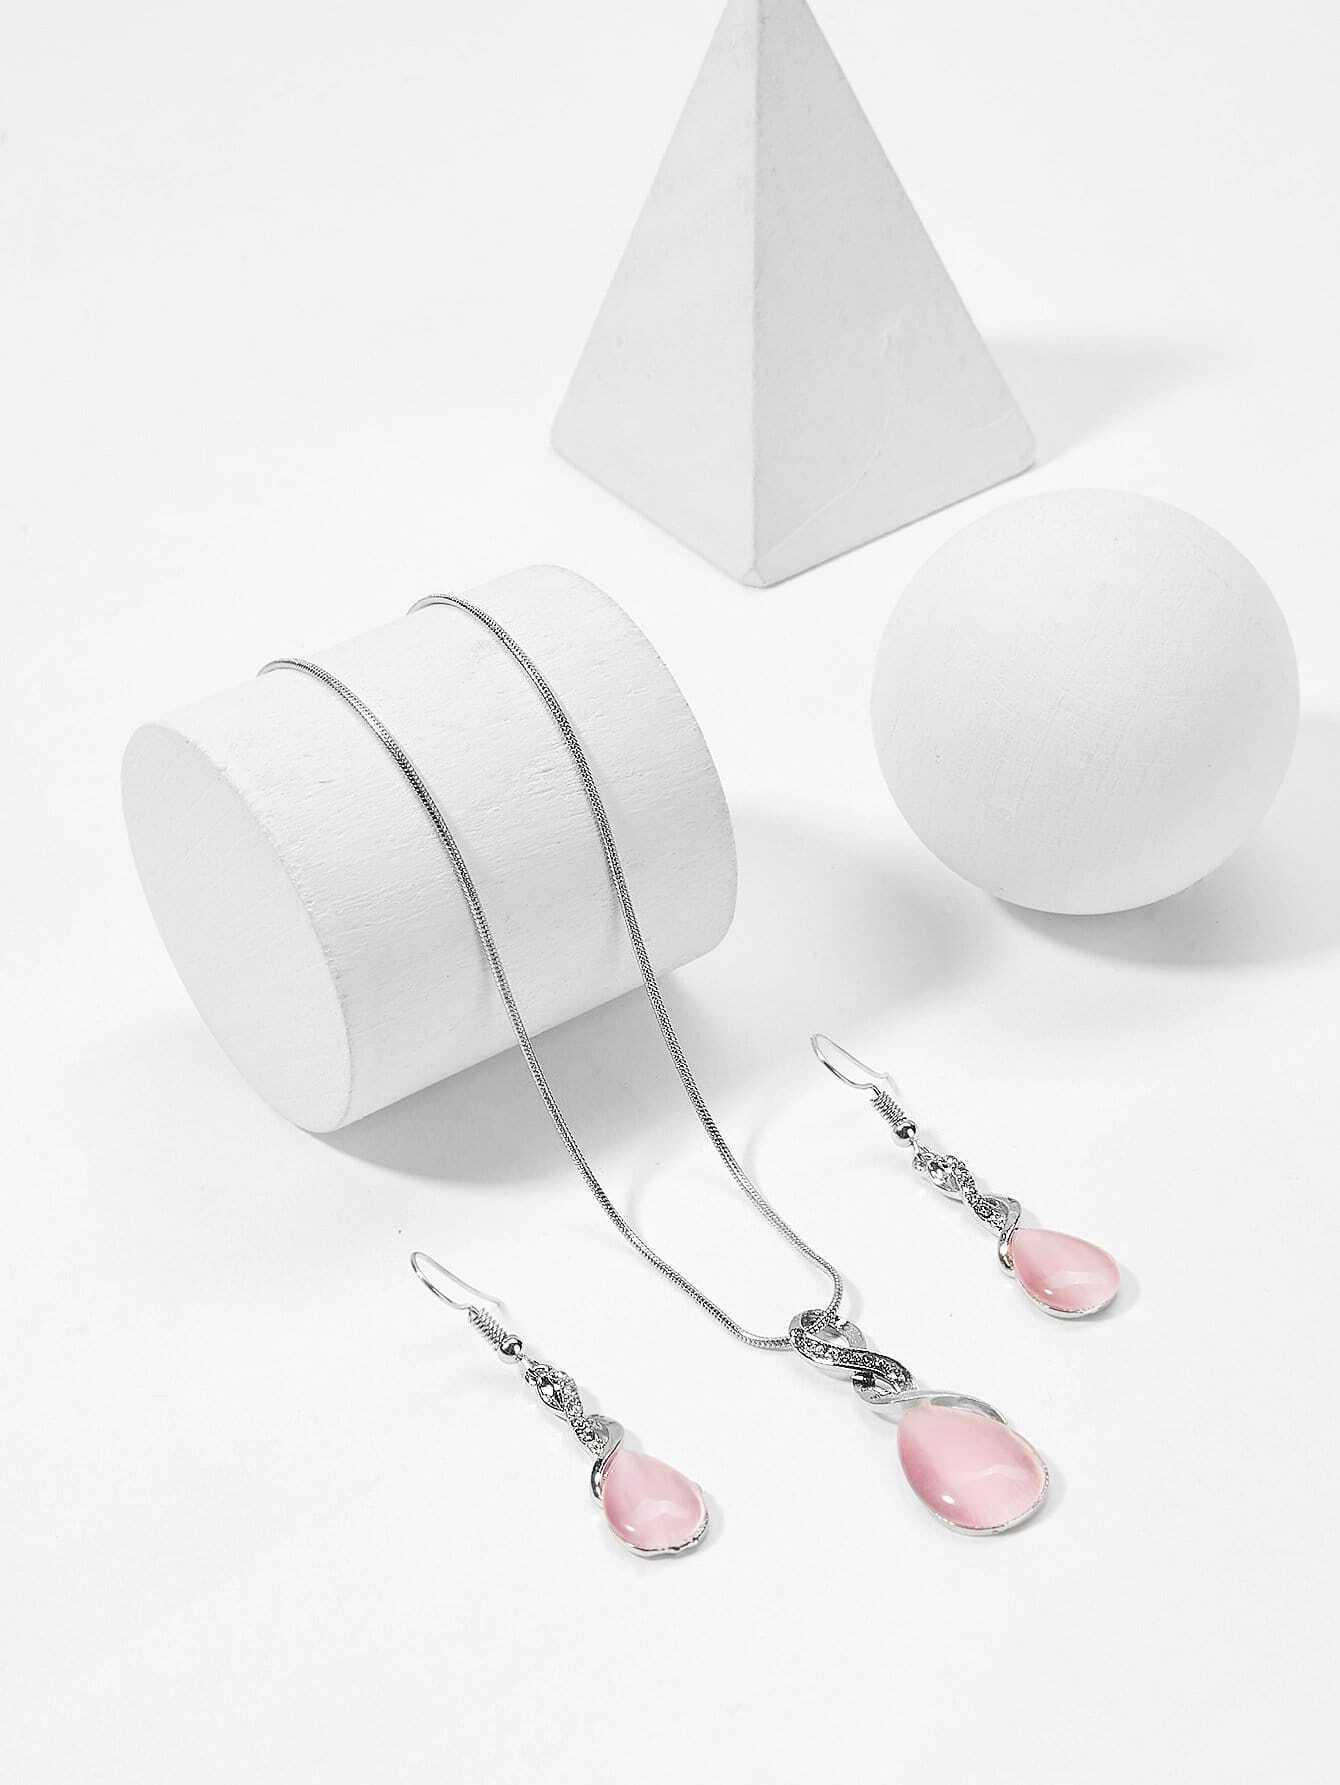 Gemstone Pendant Necklace & Earrings Set